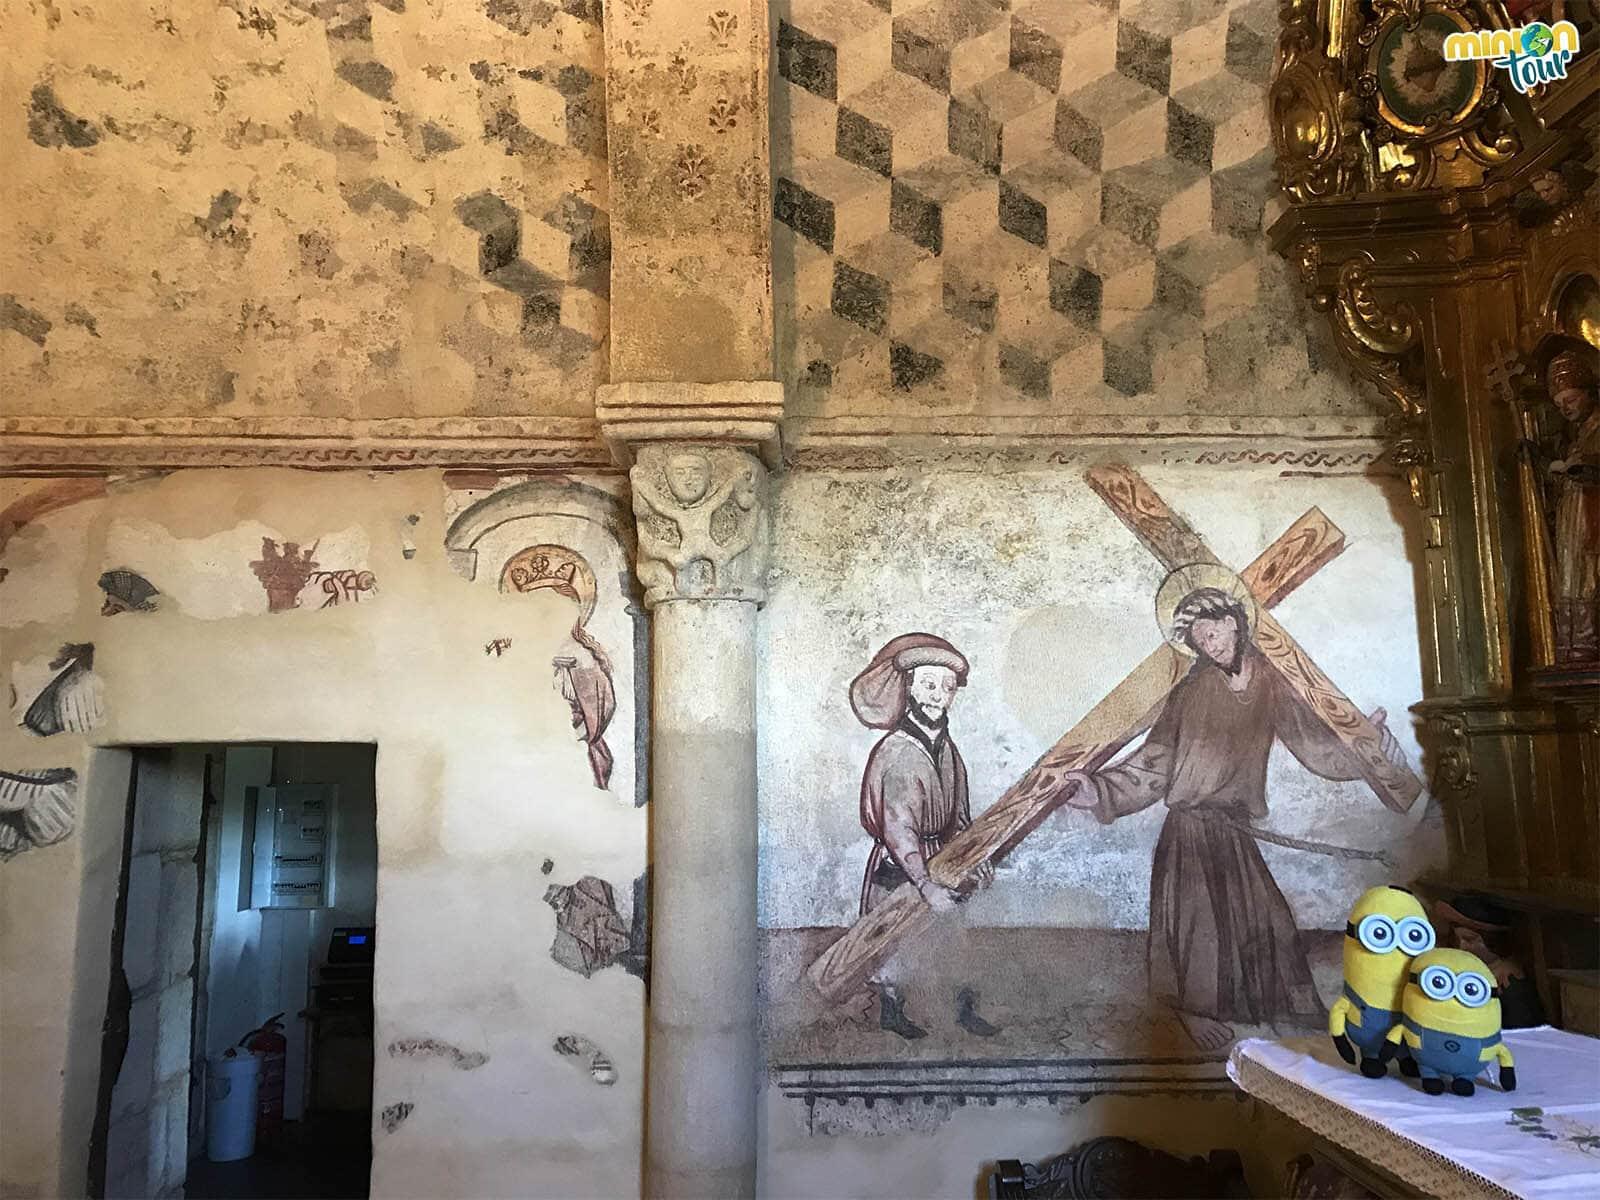 Otra pintura mural de la iglesia